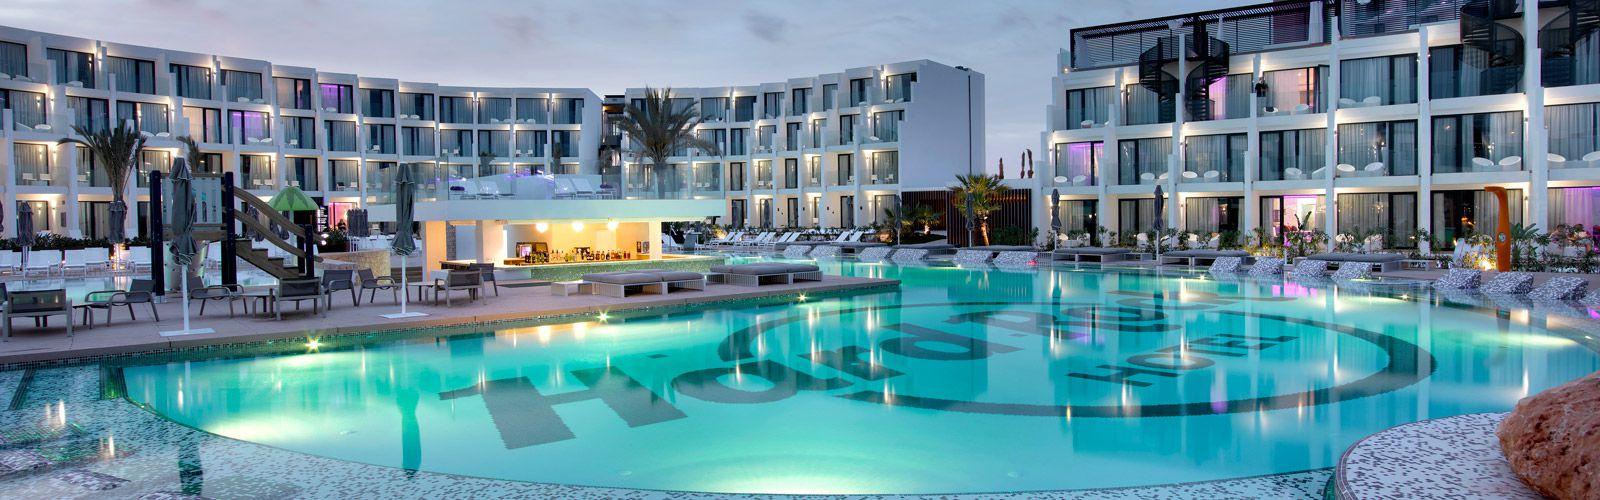 fiesta hotel and casino employment